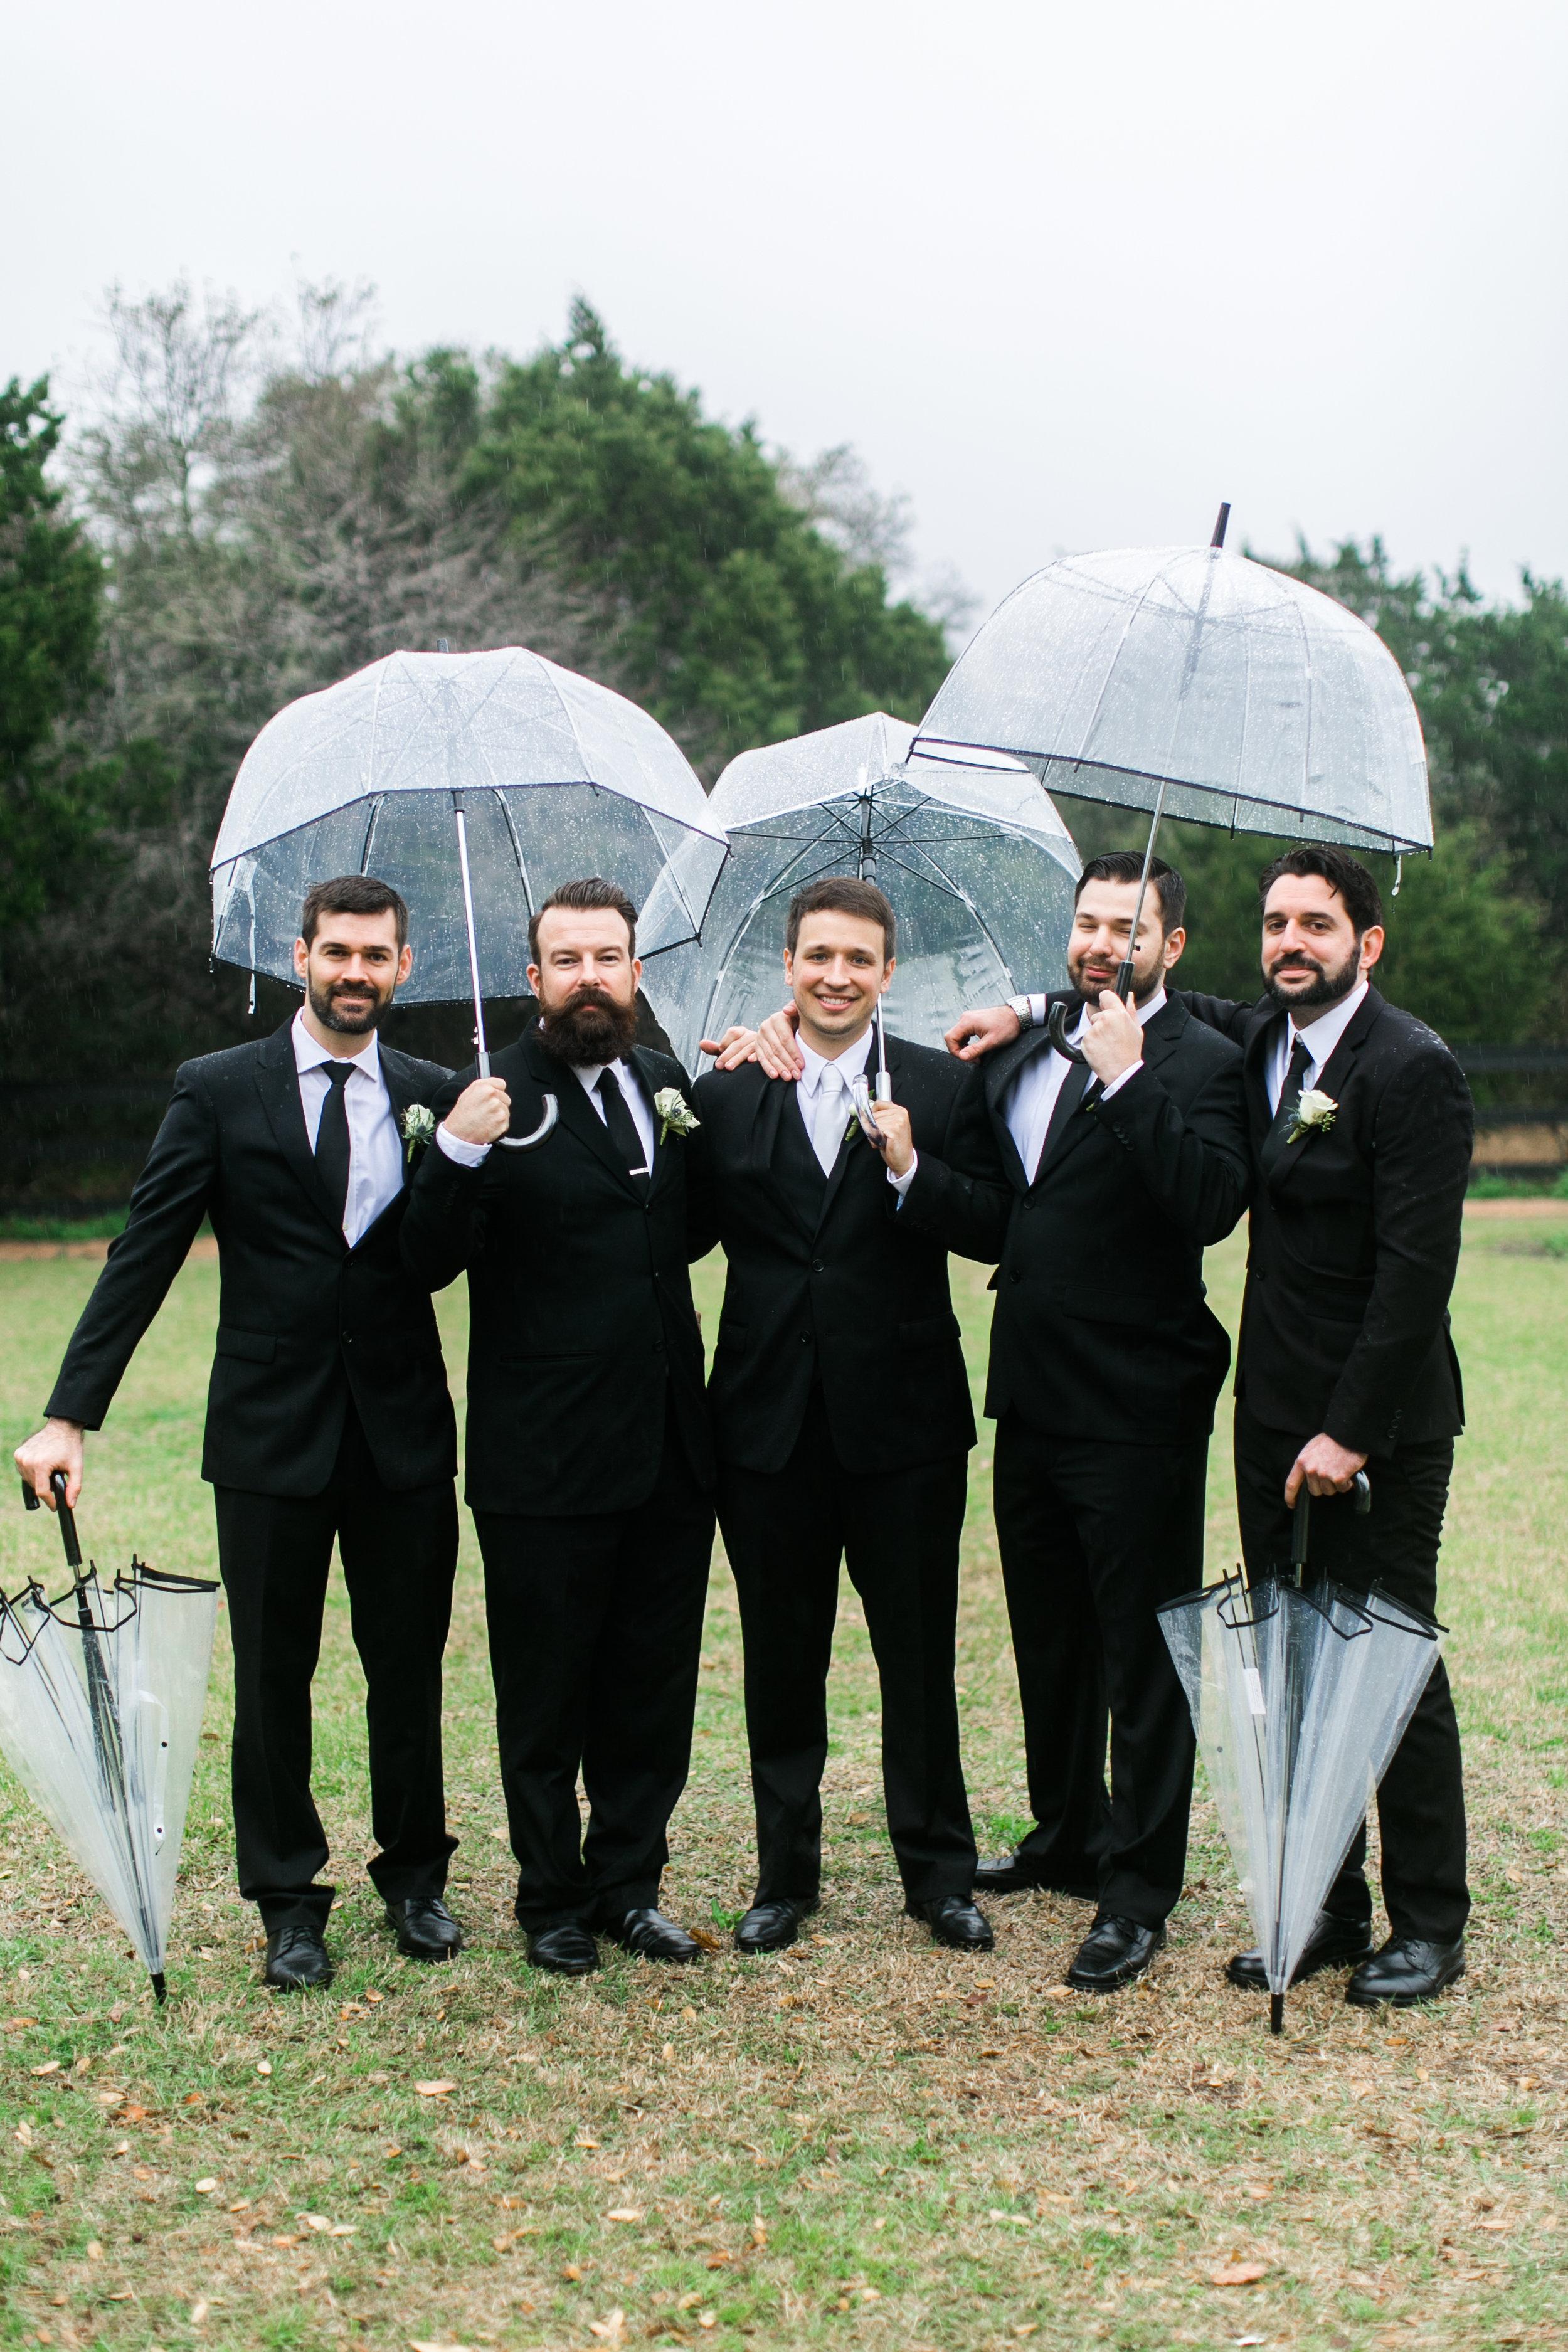 Austin_Texas_Fine_Art_Wedding_Photographer_Kayla_Snell_Photography_Antebellum_Oaks316.jpg